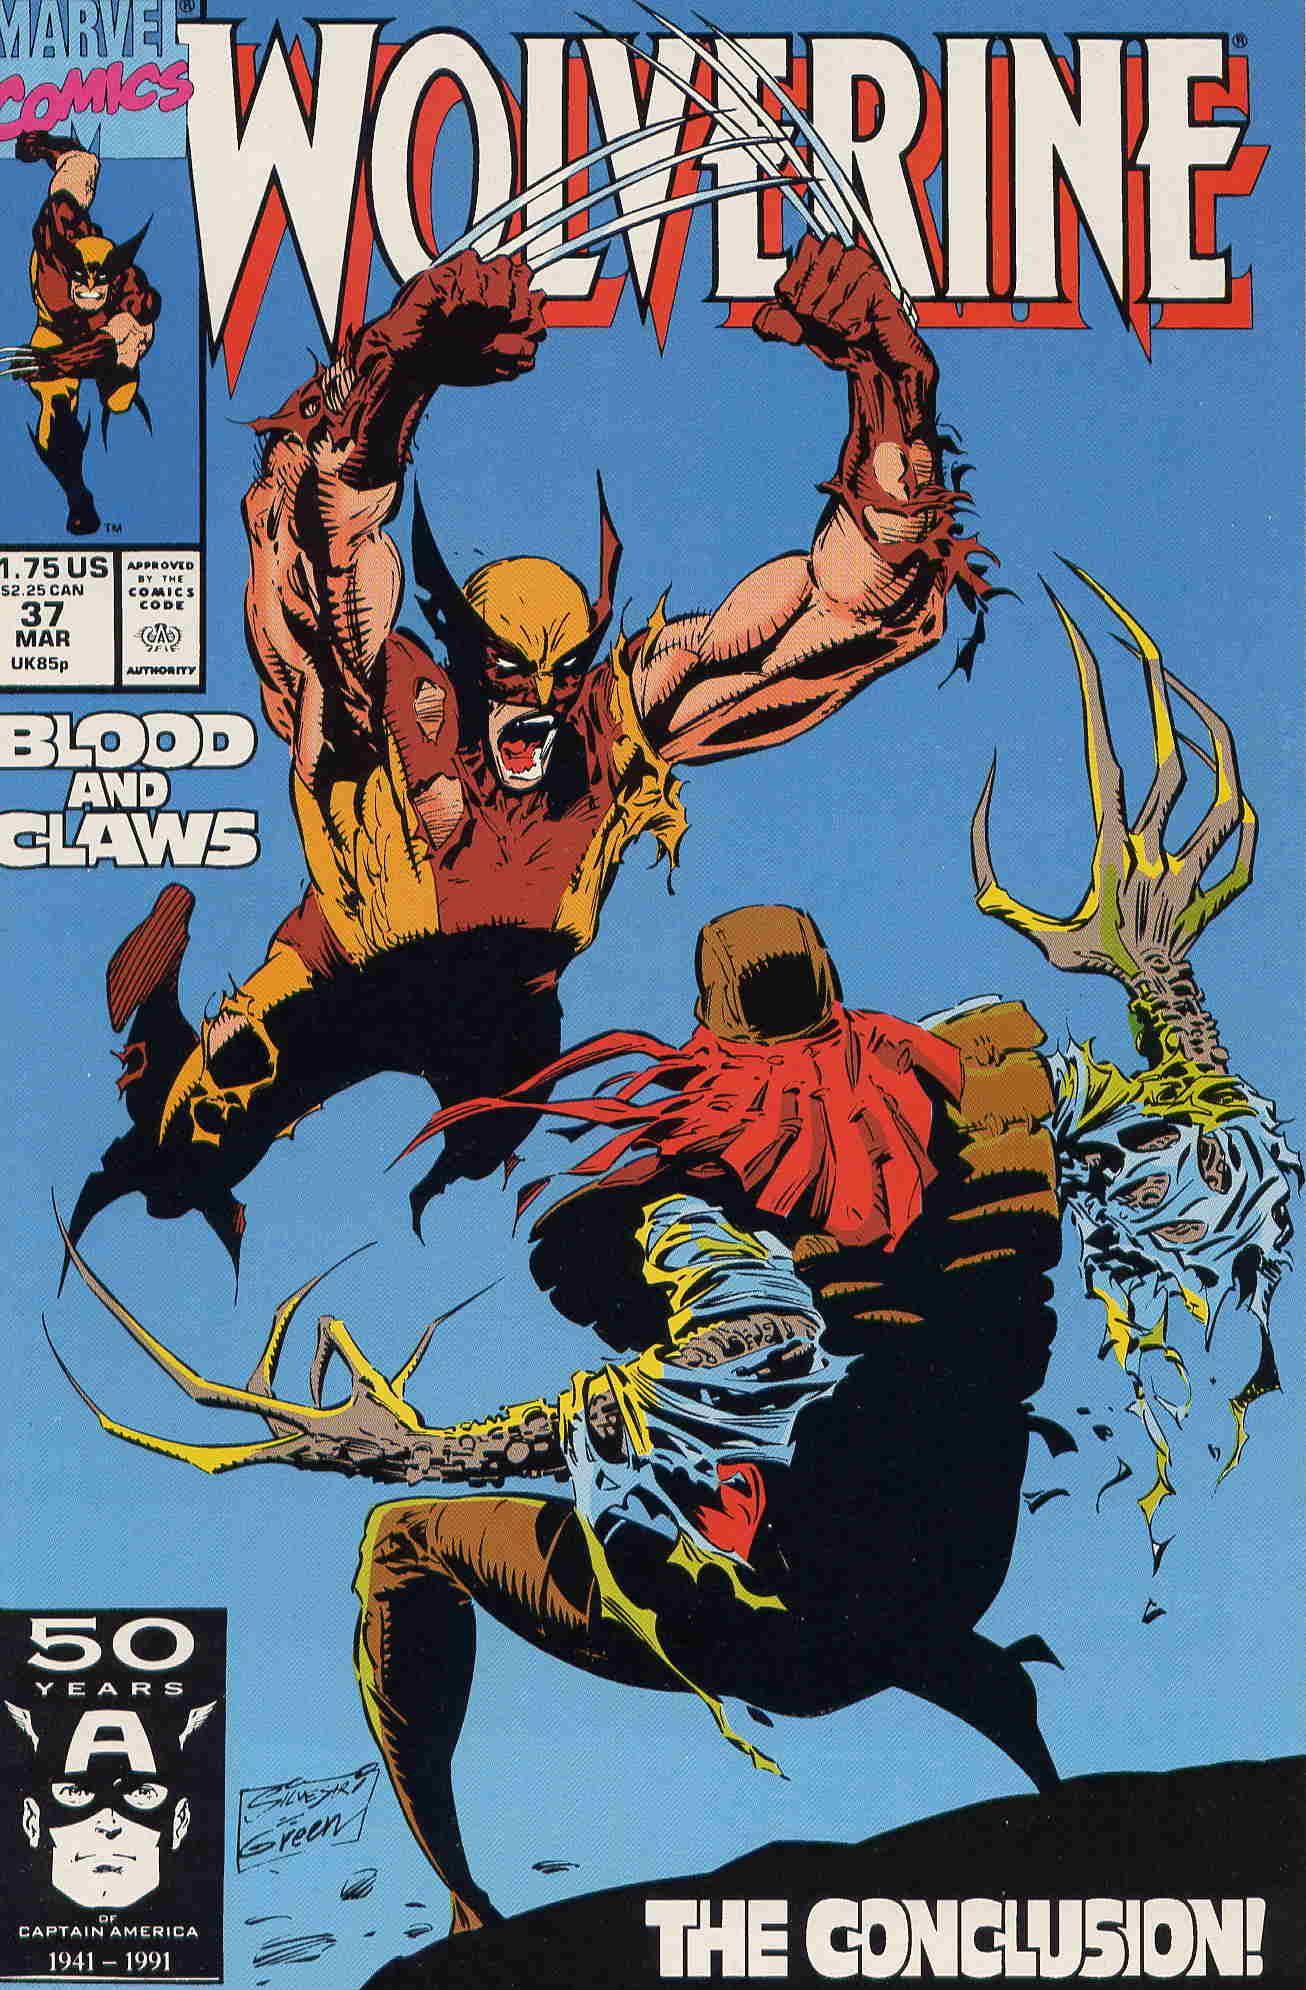 0295a327656 Wolverine (vol.1) #37 by Marc Silvestri #LadyDeathstrike   Favorite ...